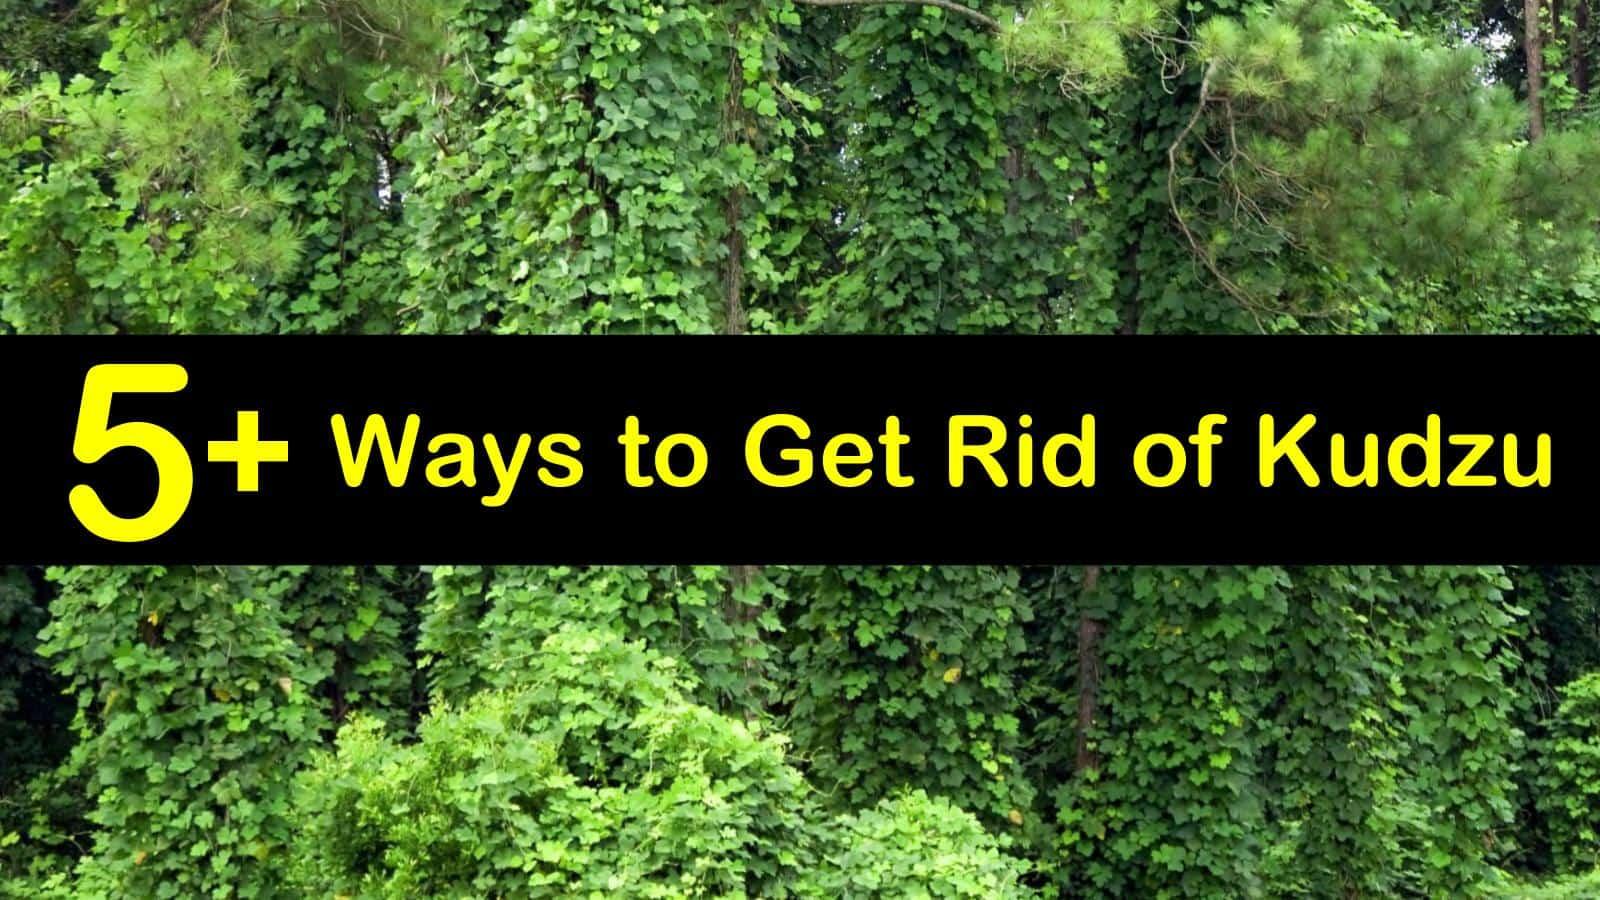 how to get rid of kudzu titleimg1